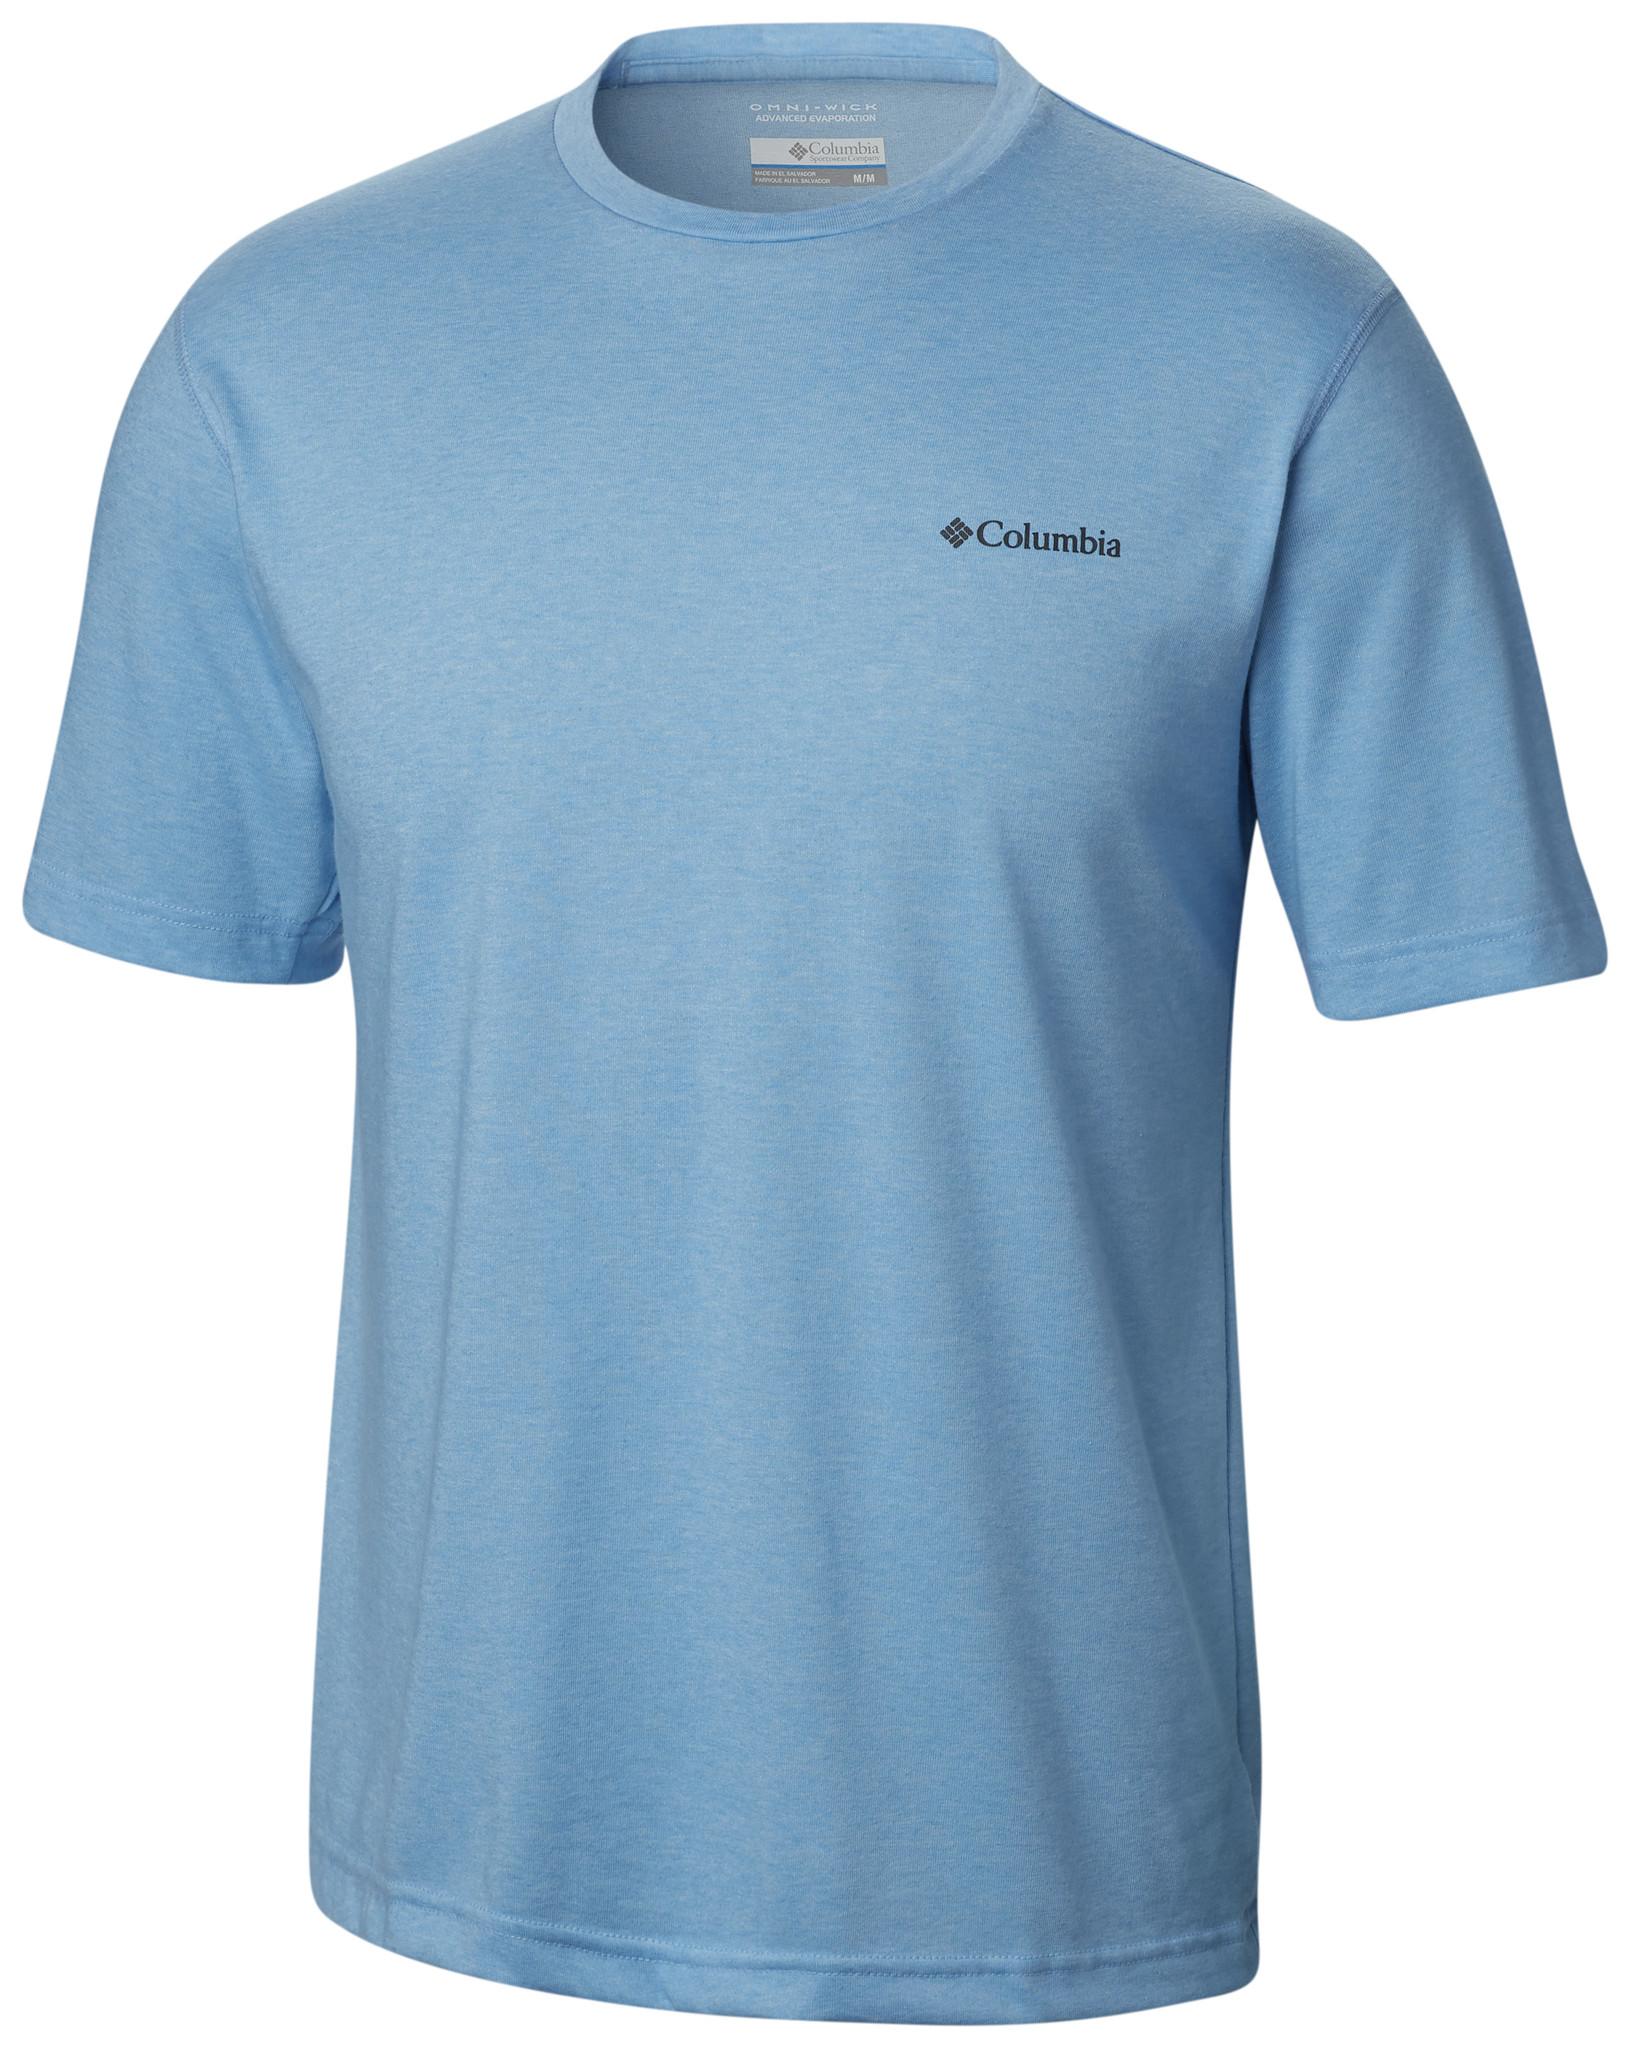 Columbia Sportwear Columbia Thistletown Park™ Crew